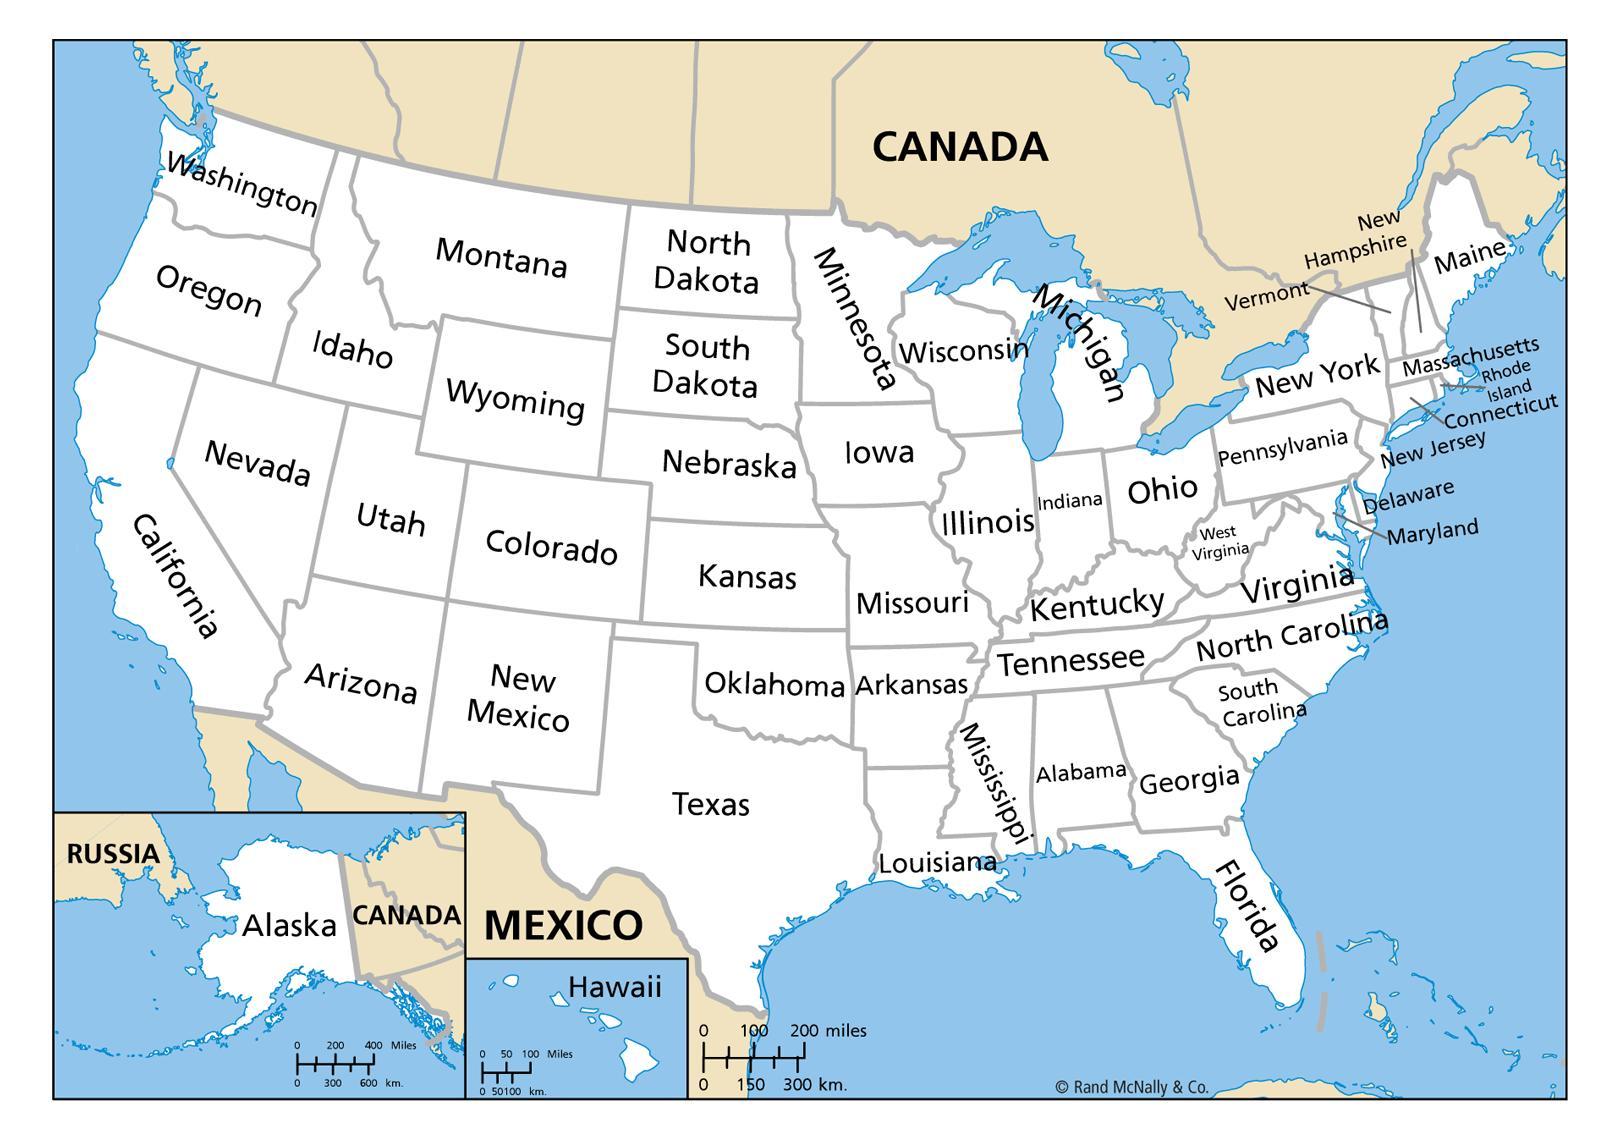 Mapa Usa Se Staty Mapa Spojenych Statu Se Staty Severni Ameriky